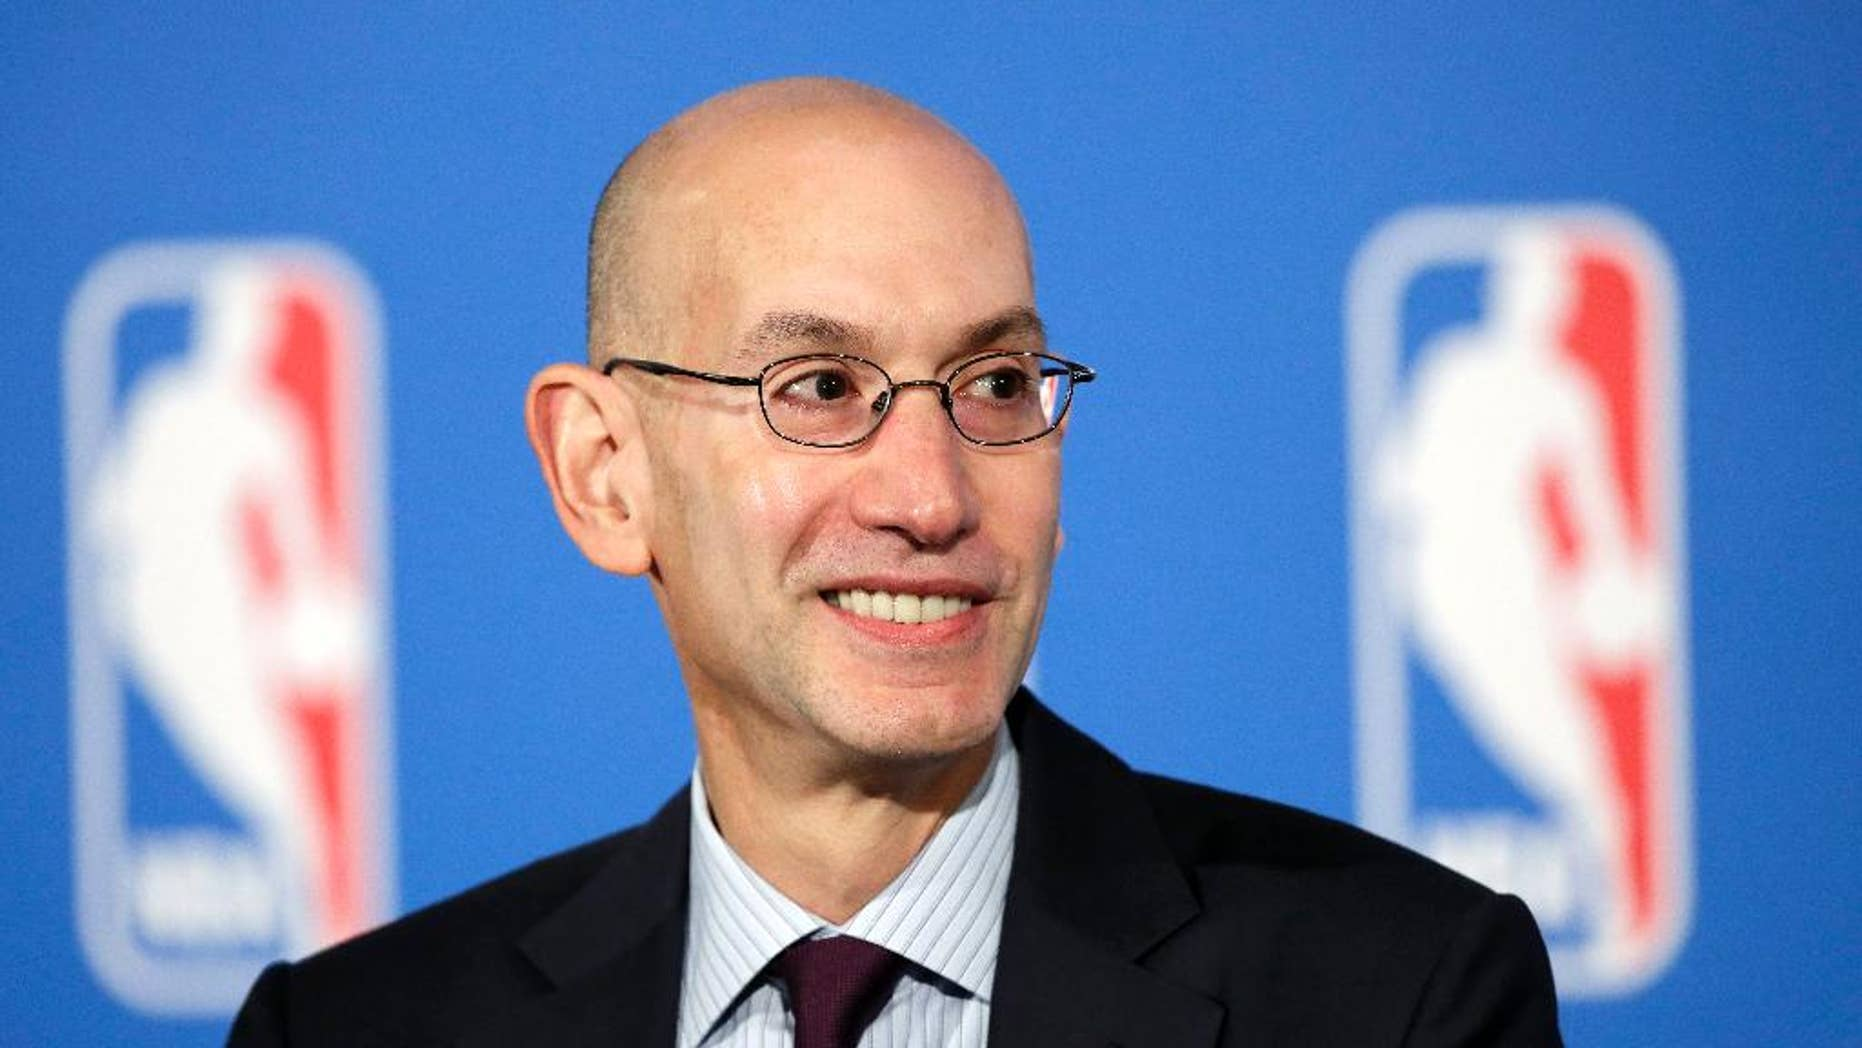 NBA Commissioner Adam Silver in 2014.